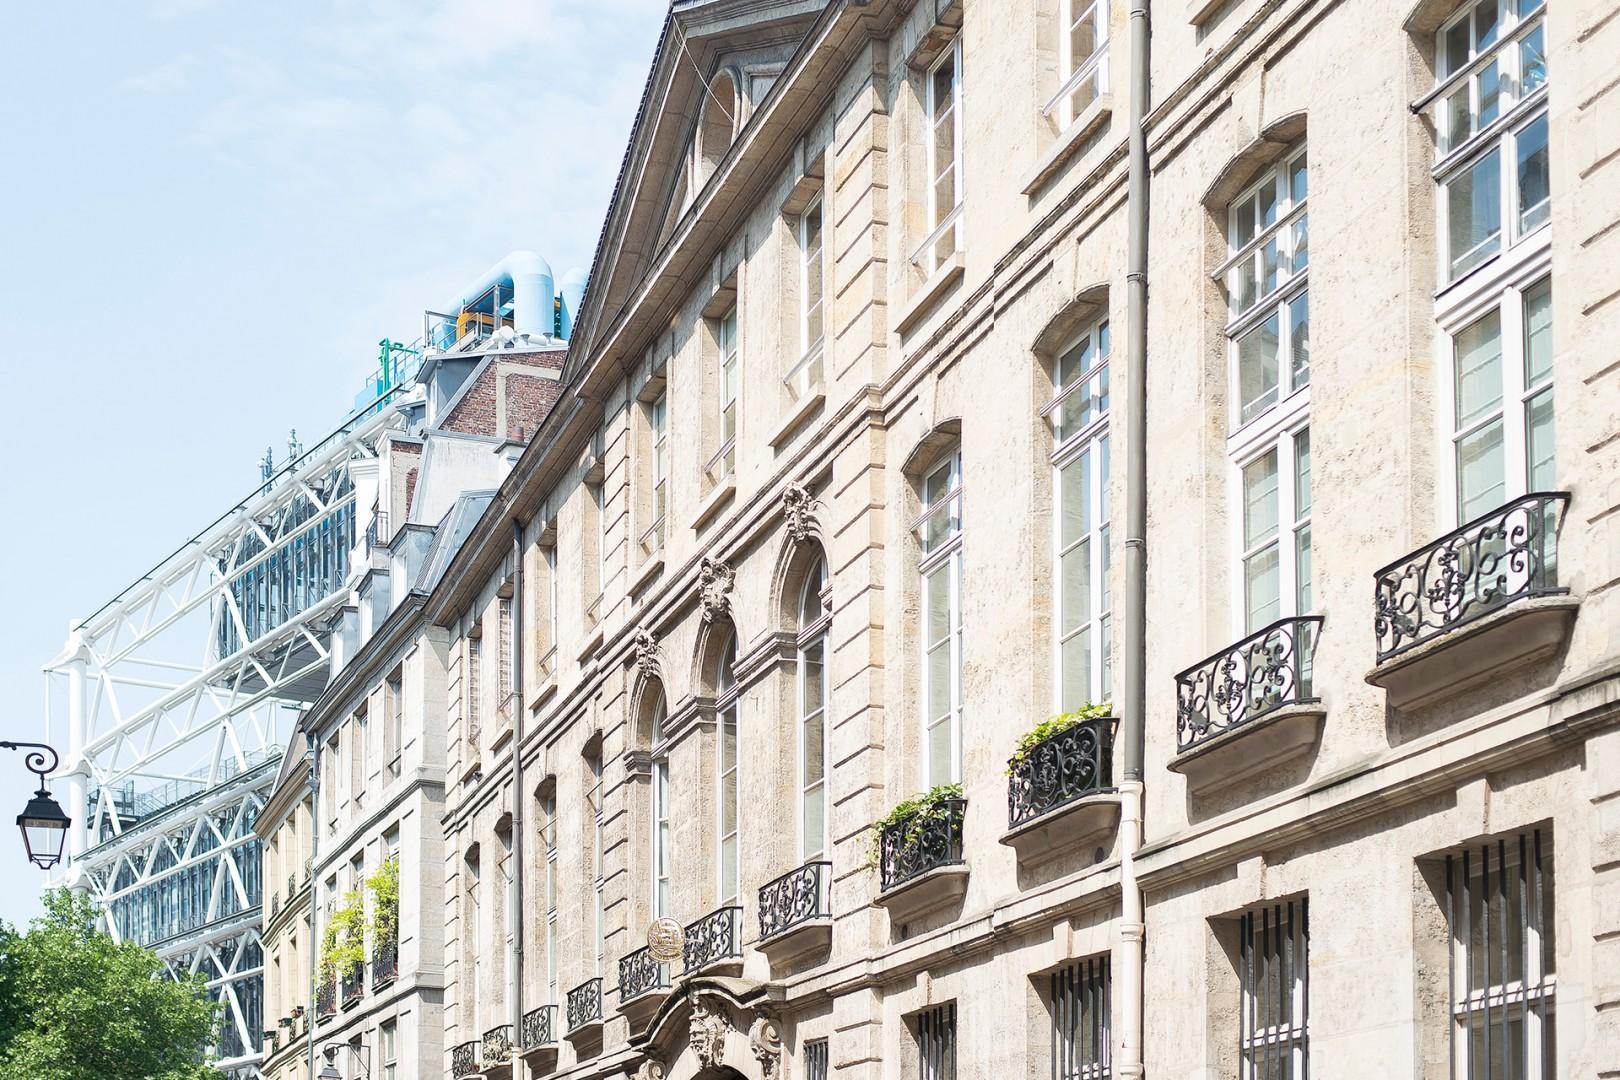 BR-marais-buildings-street-pompidou-center-paris